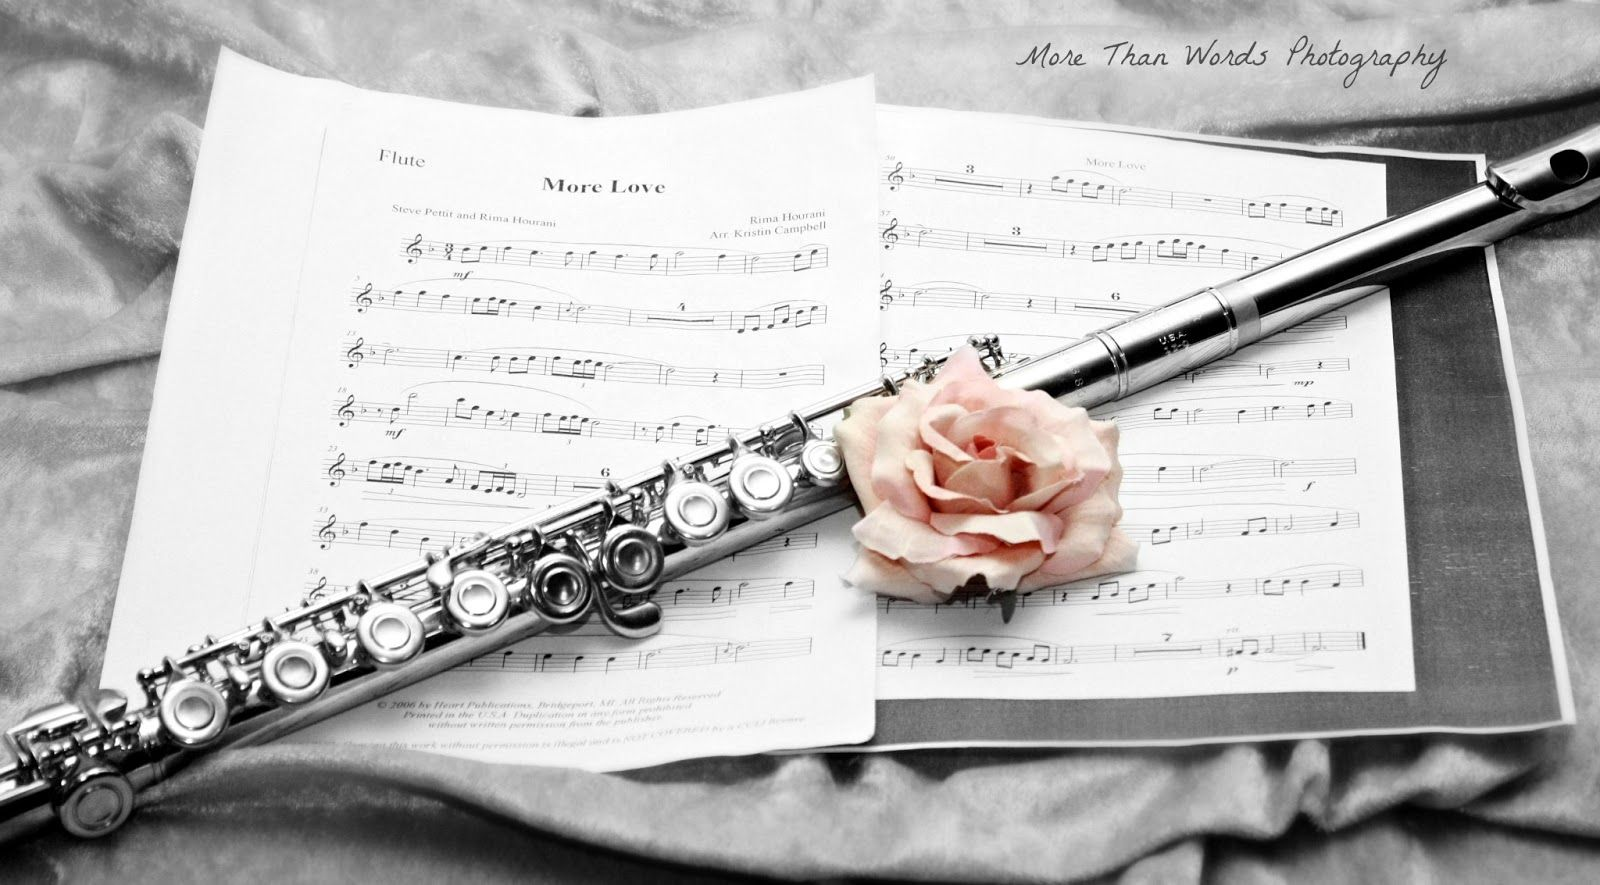 100+ Best Flute Images HD Free Download (2019) | Good Morning Images